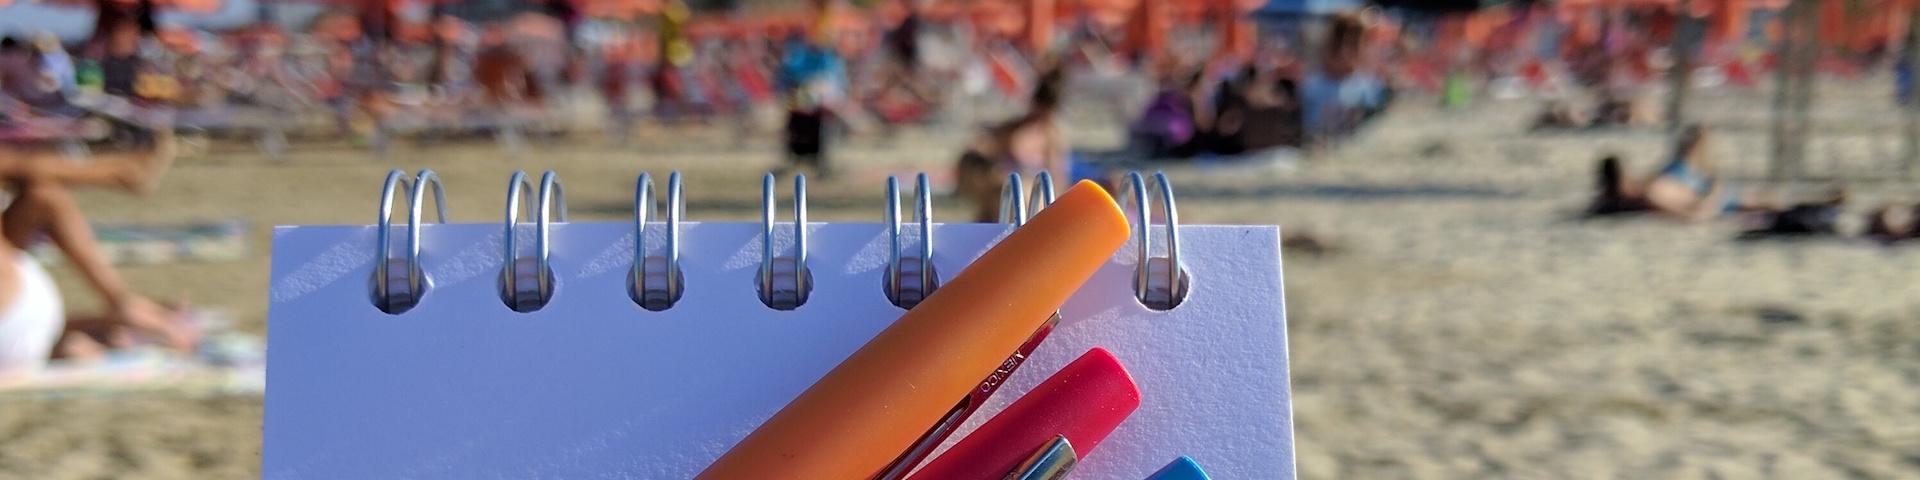 beach-parasols-featured